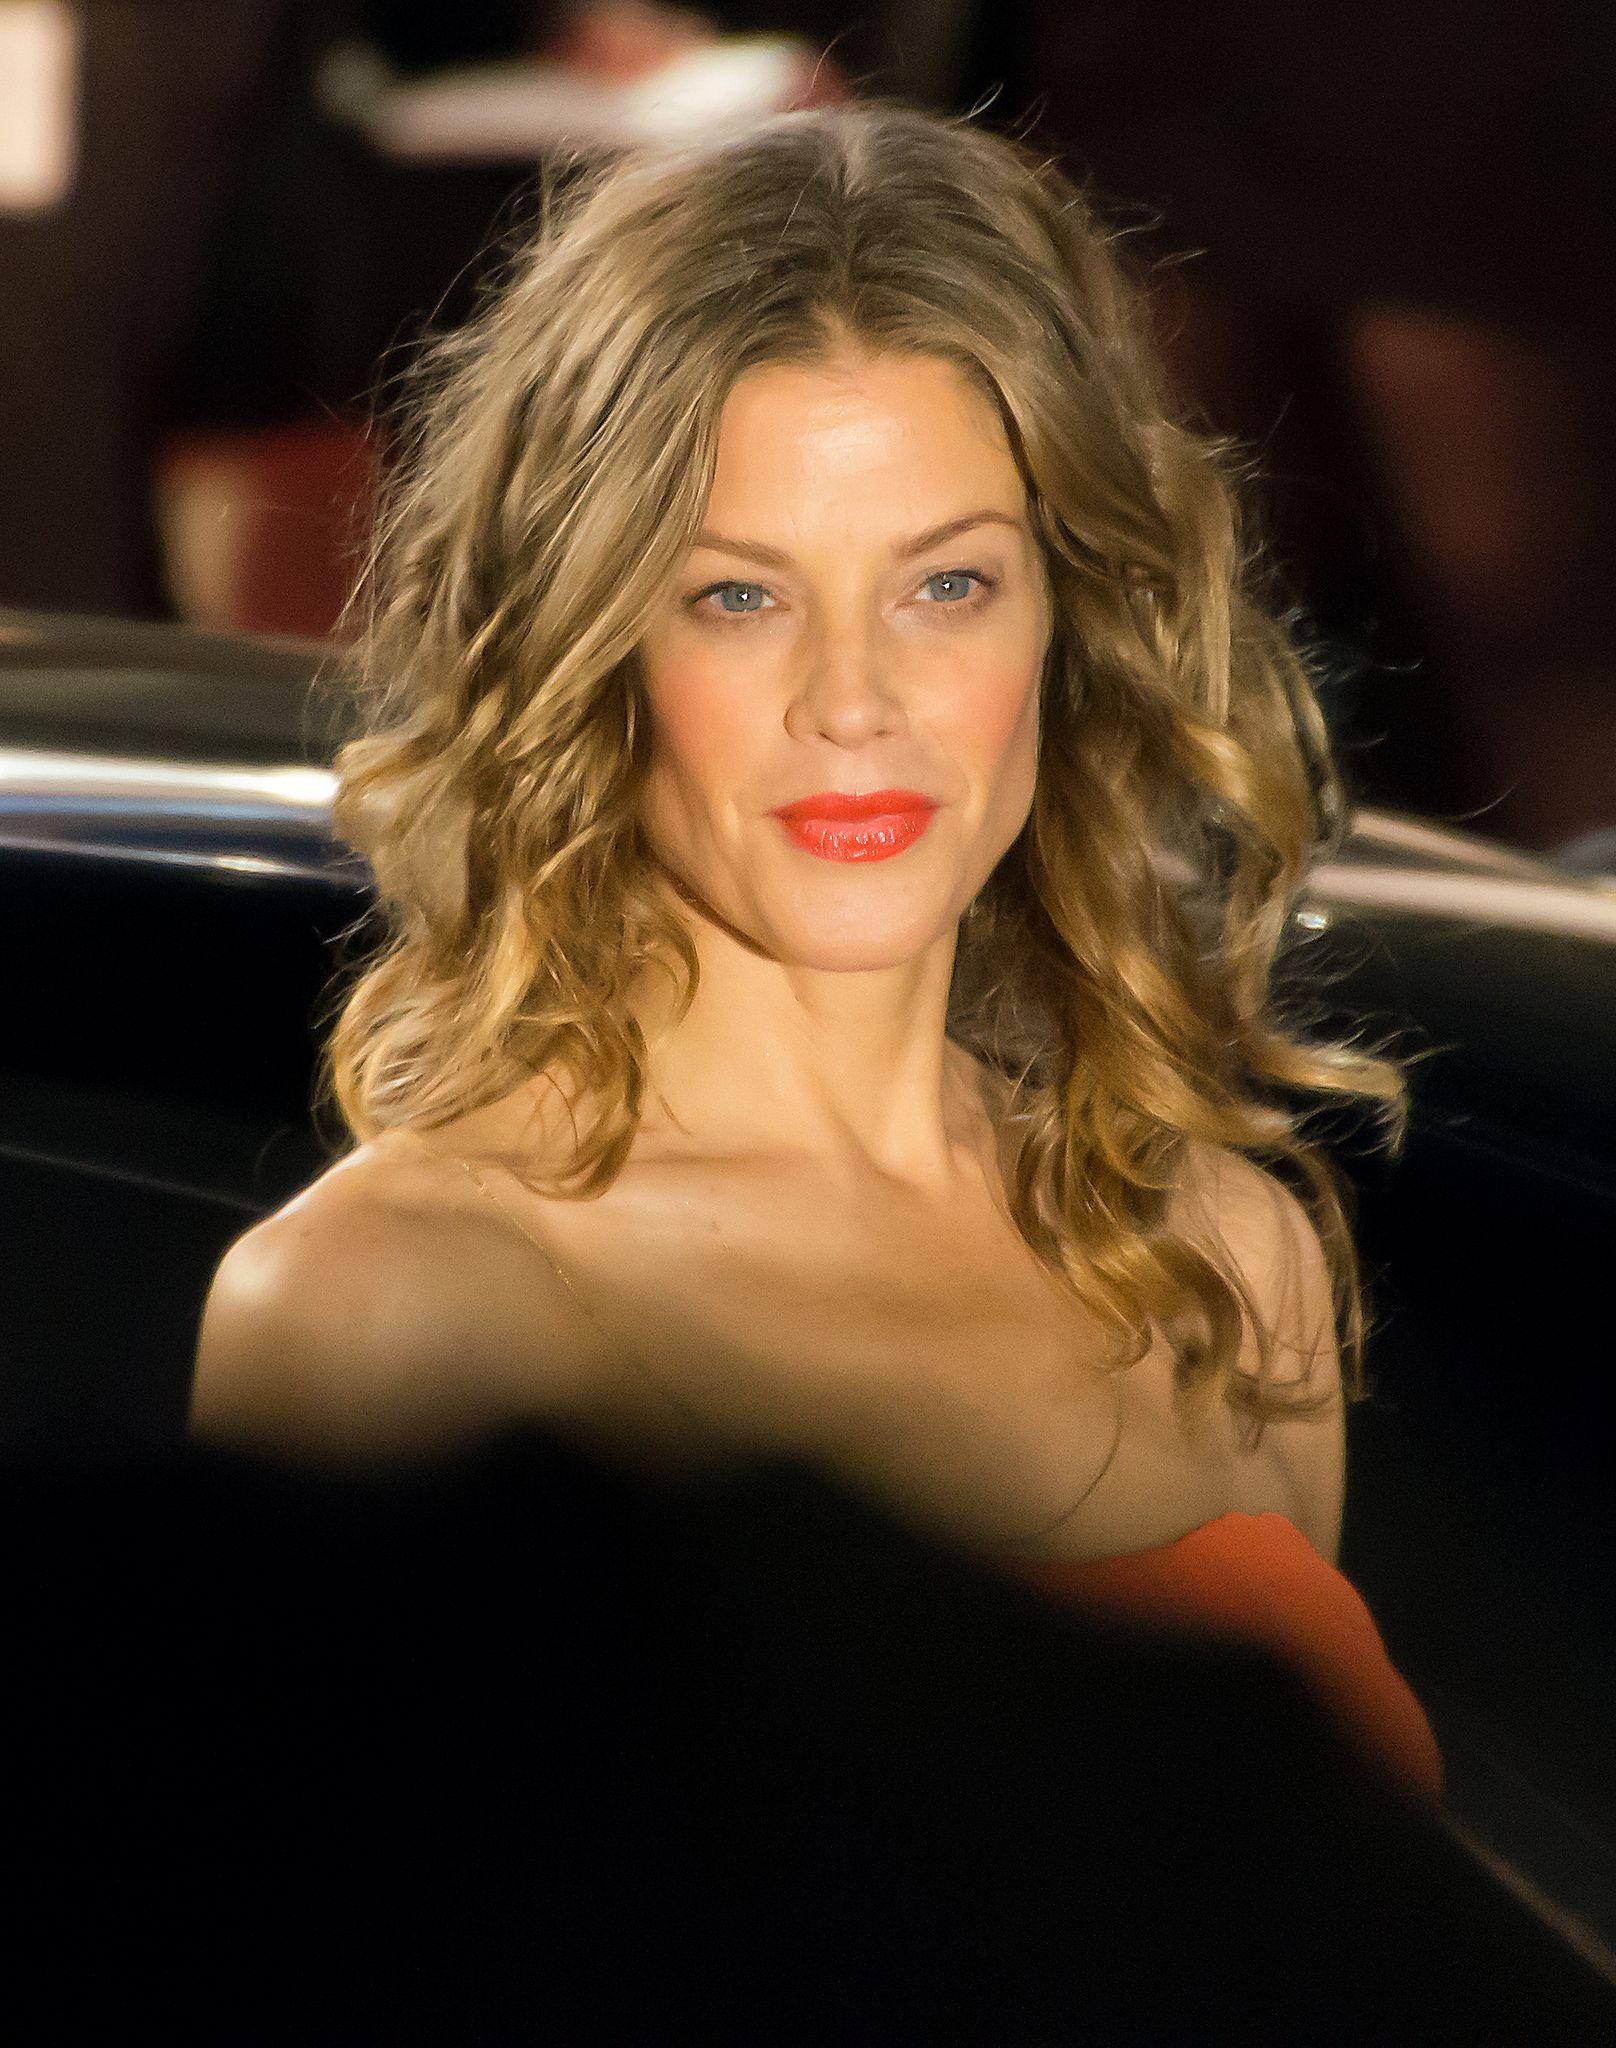 Marie Bäumer - Bambi 2013 | Wundervoll, Schauspieler und